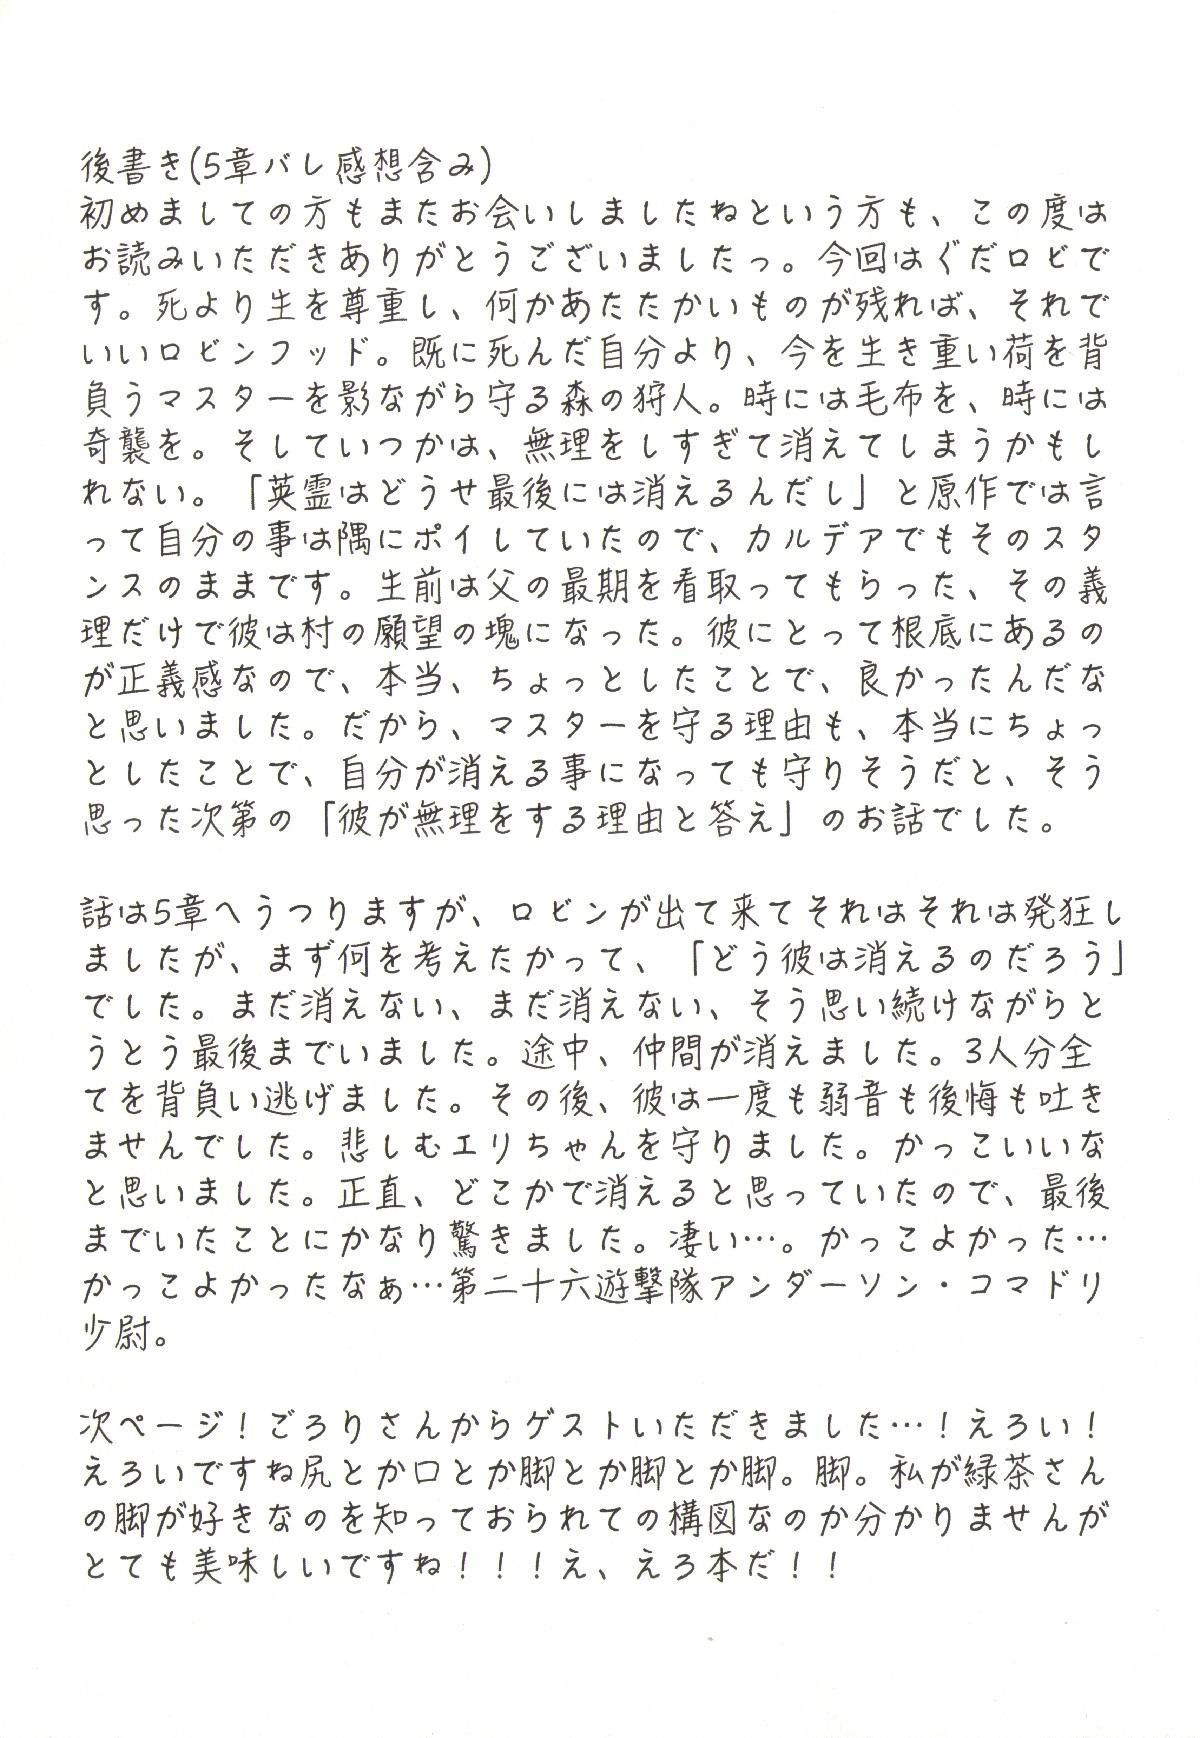 REASON/ANSWER 39